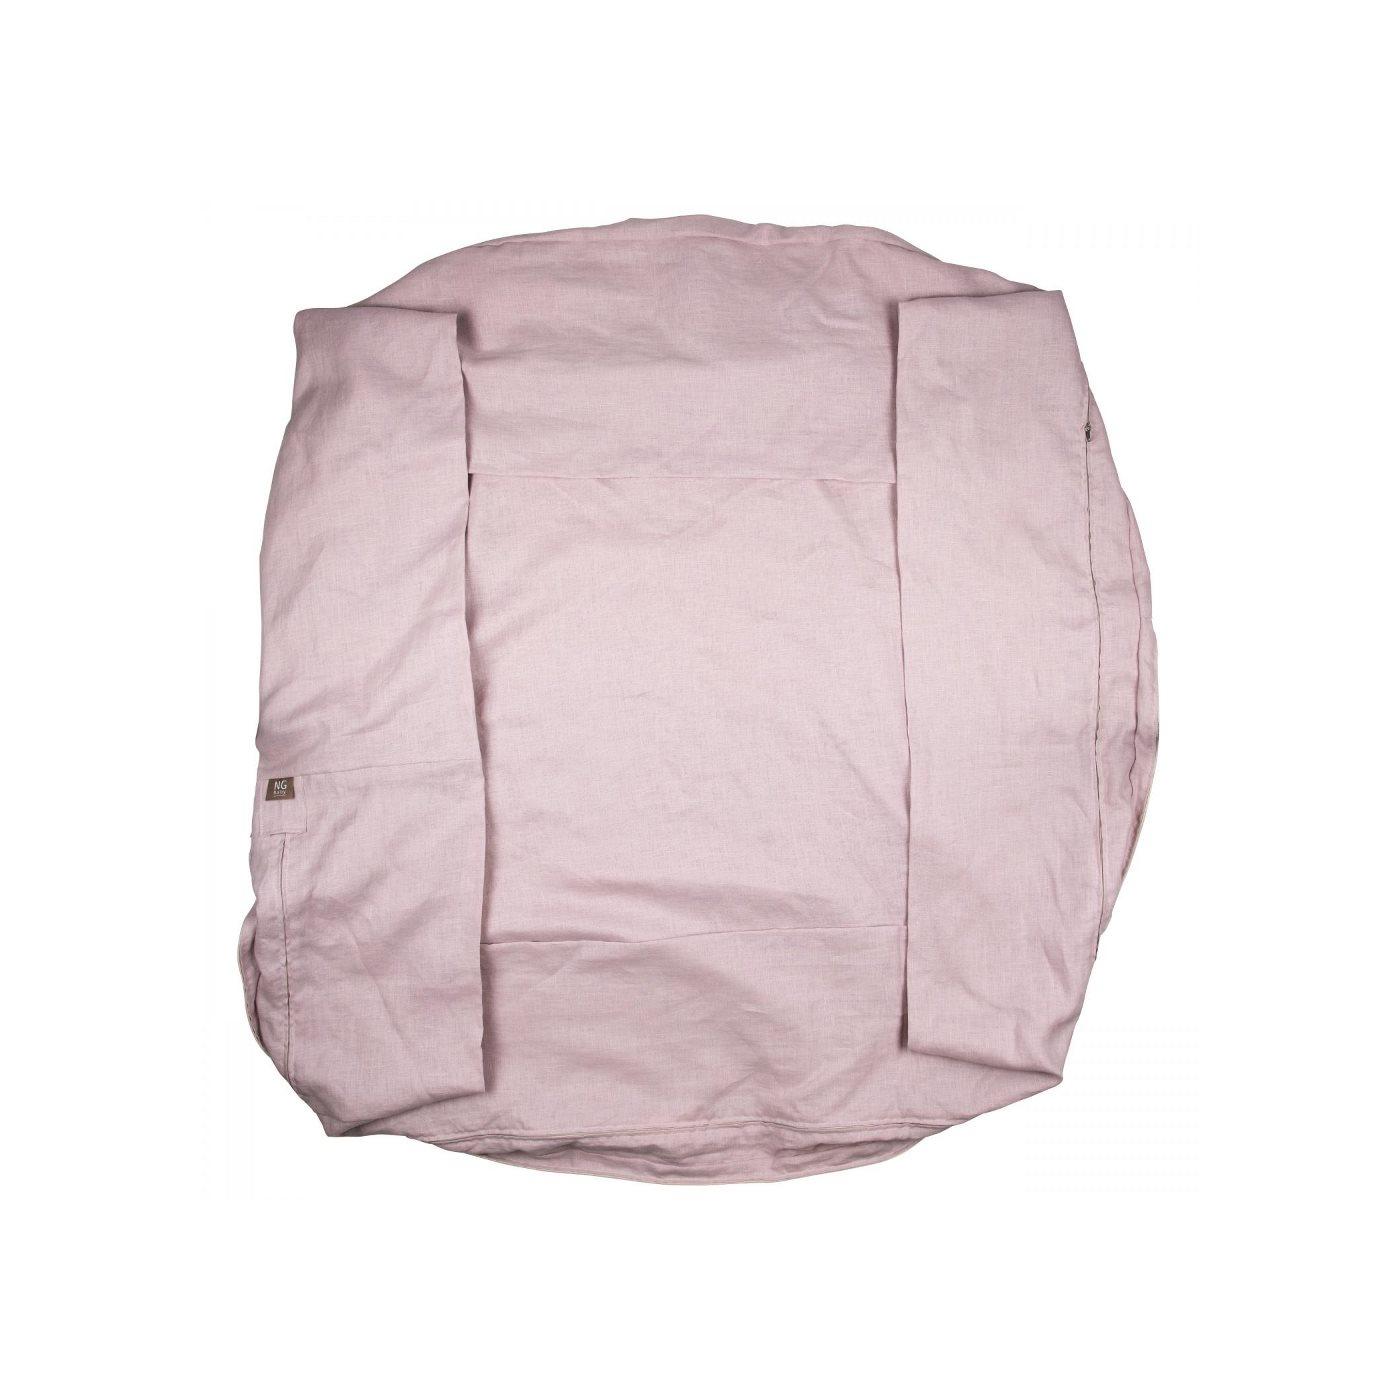 Överdrag Myspöl 120 cm | Rose | Mood, NG Baby